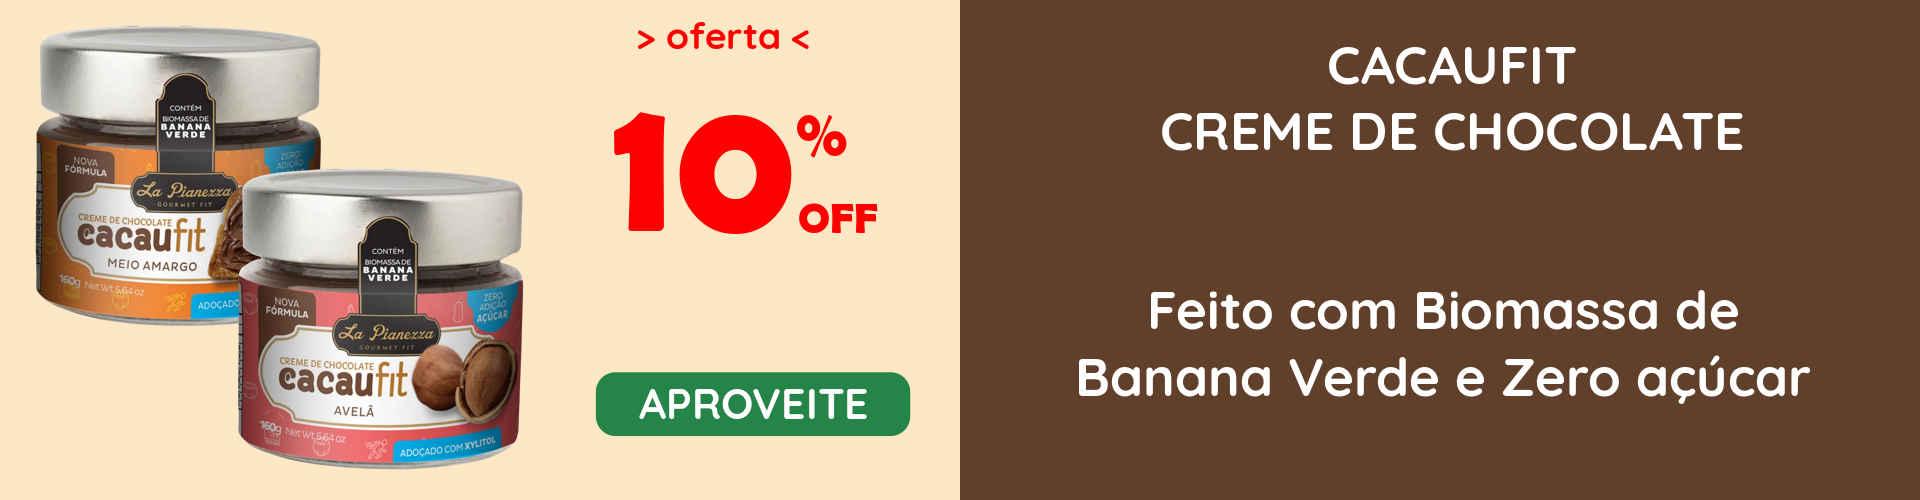 Cacaufit La Pianezza - Oferta